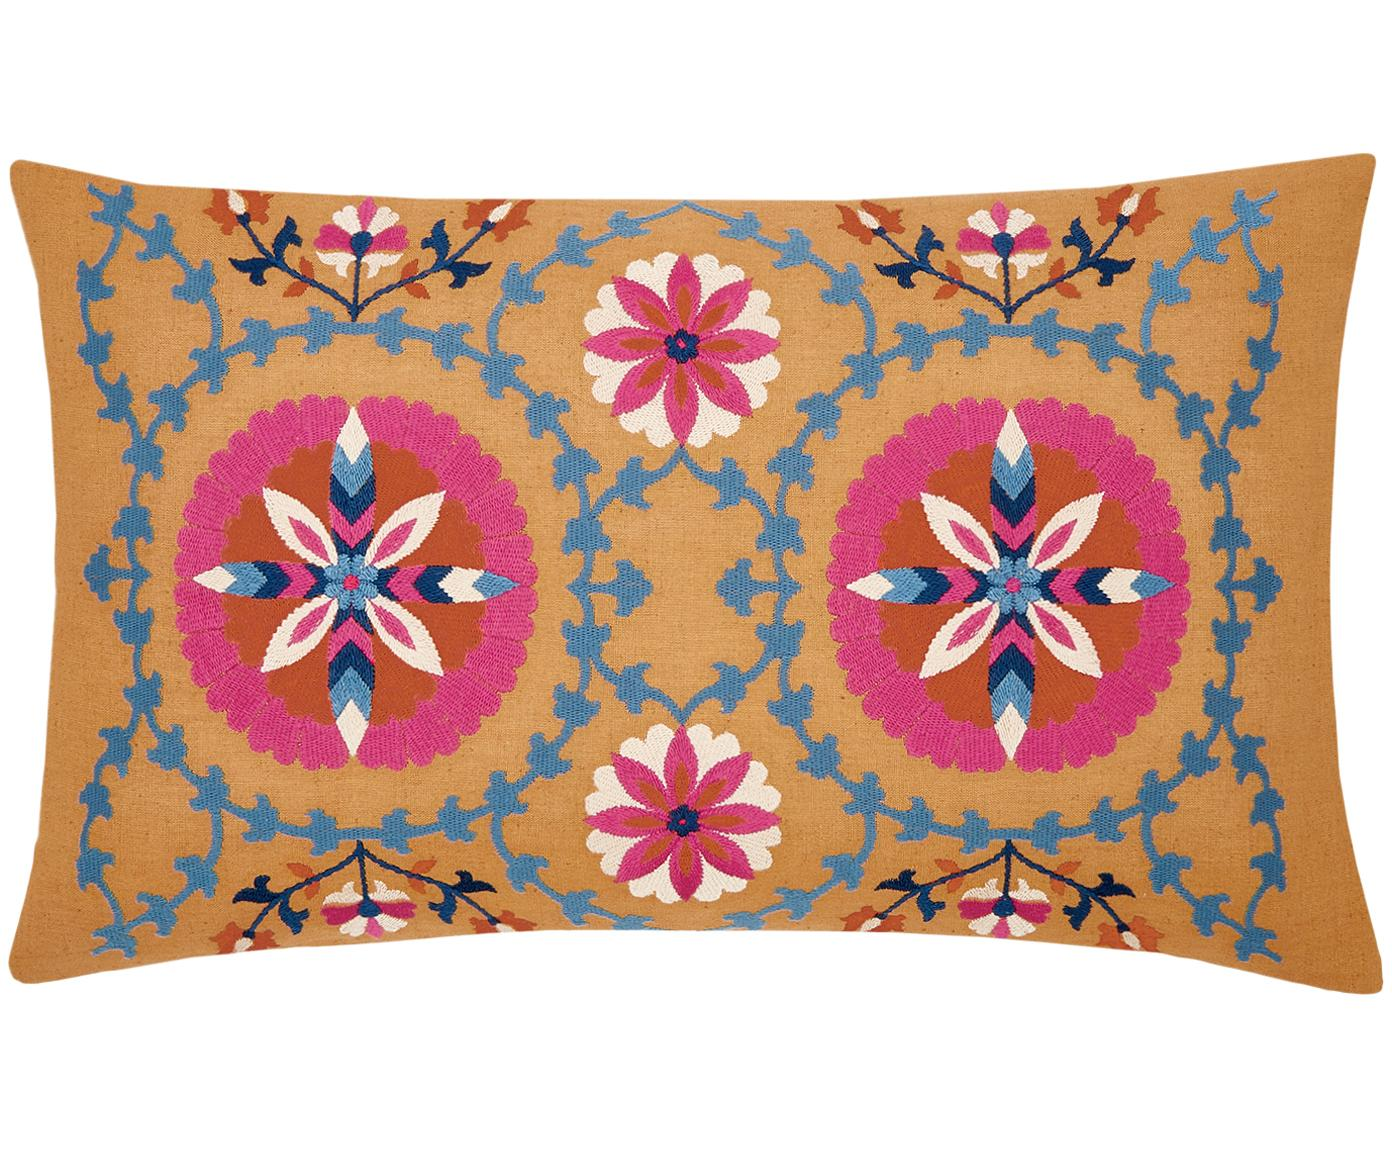 Funda de cojín bordada Tabula, Algodón, Amarillo, multicolor, An 30 x L 50 cm